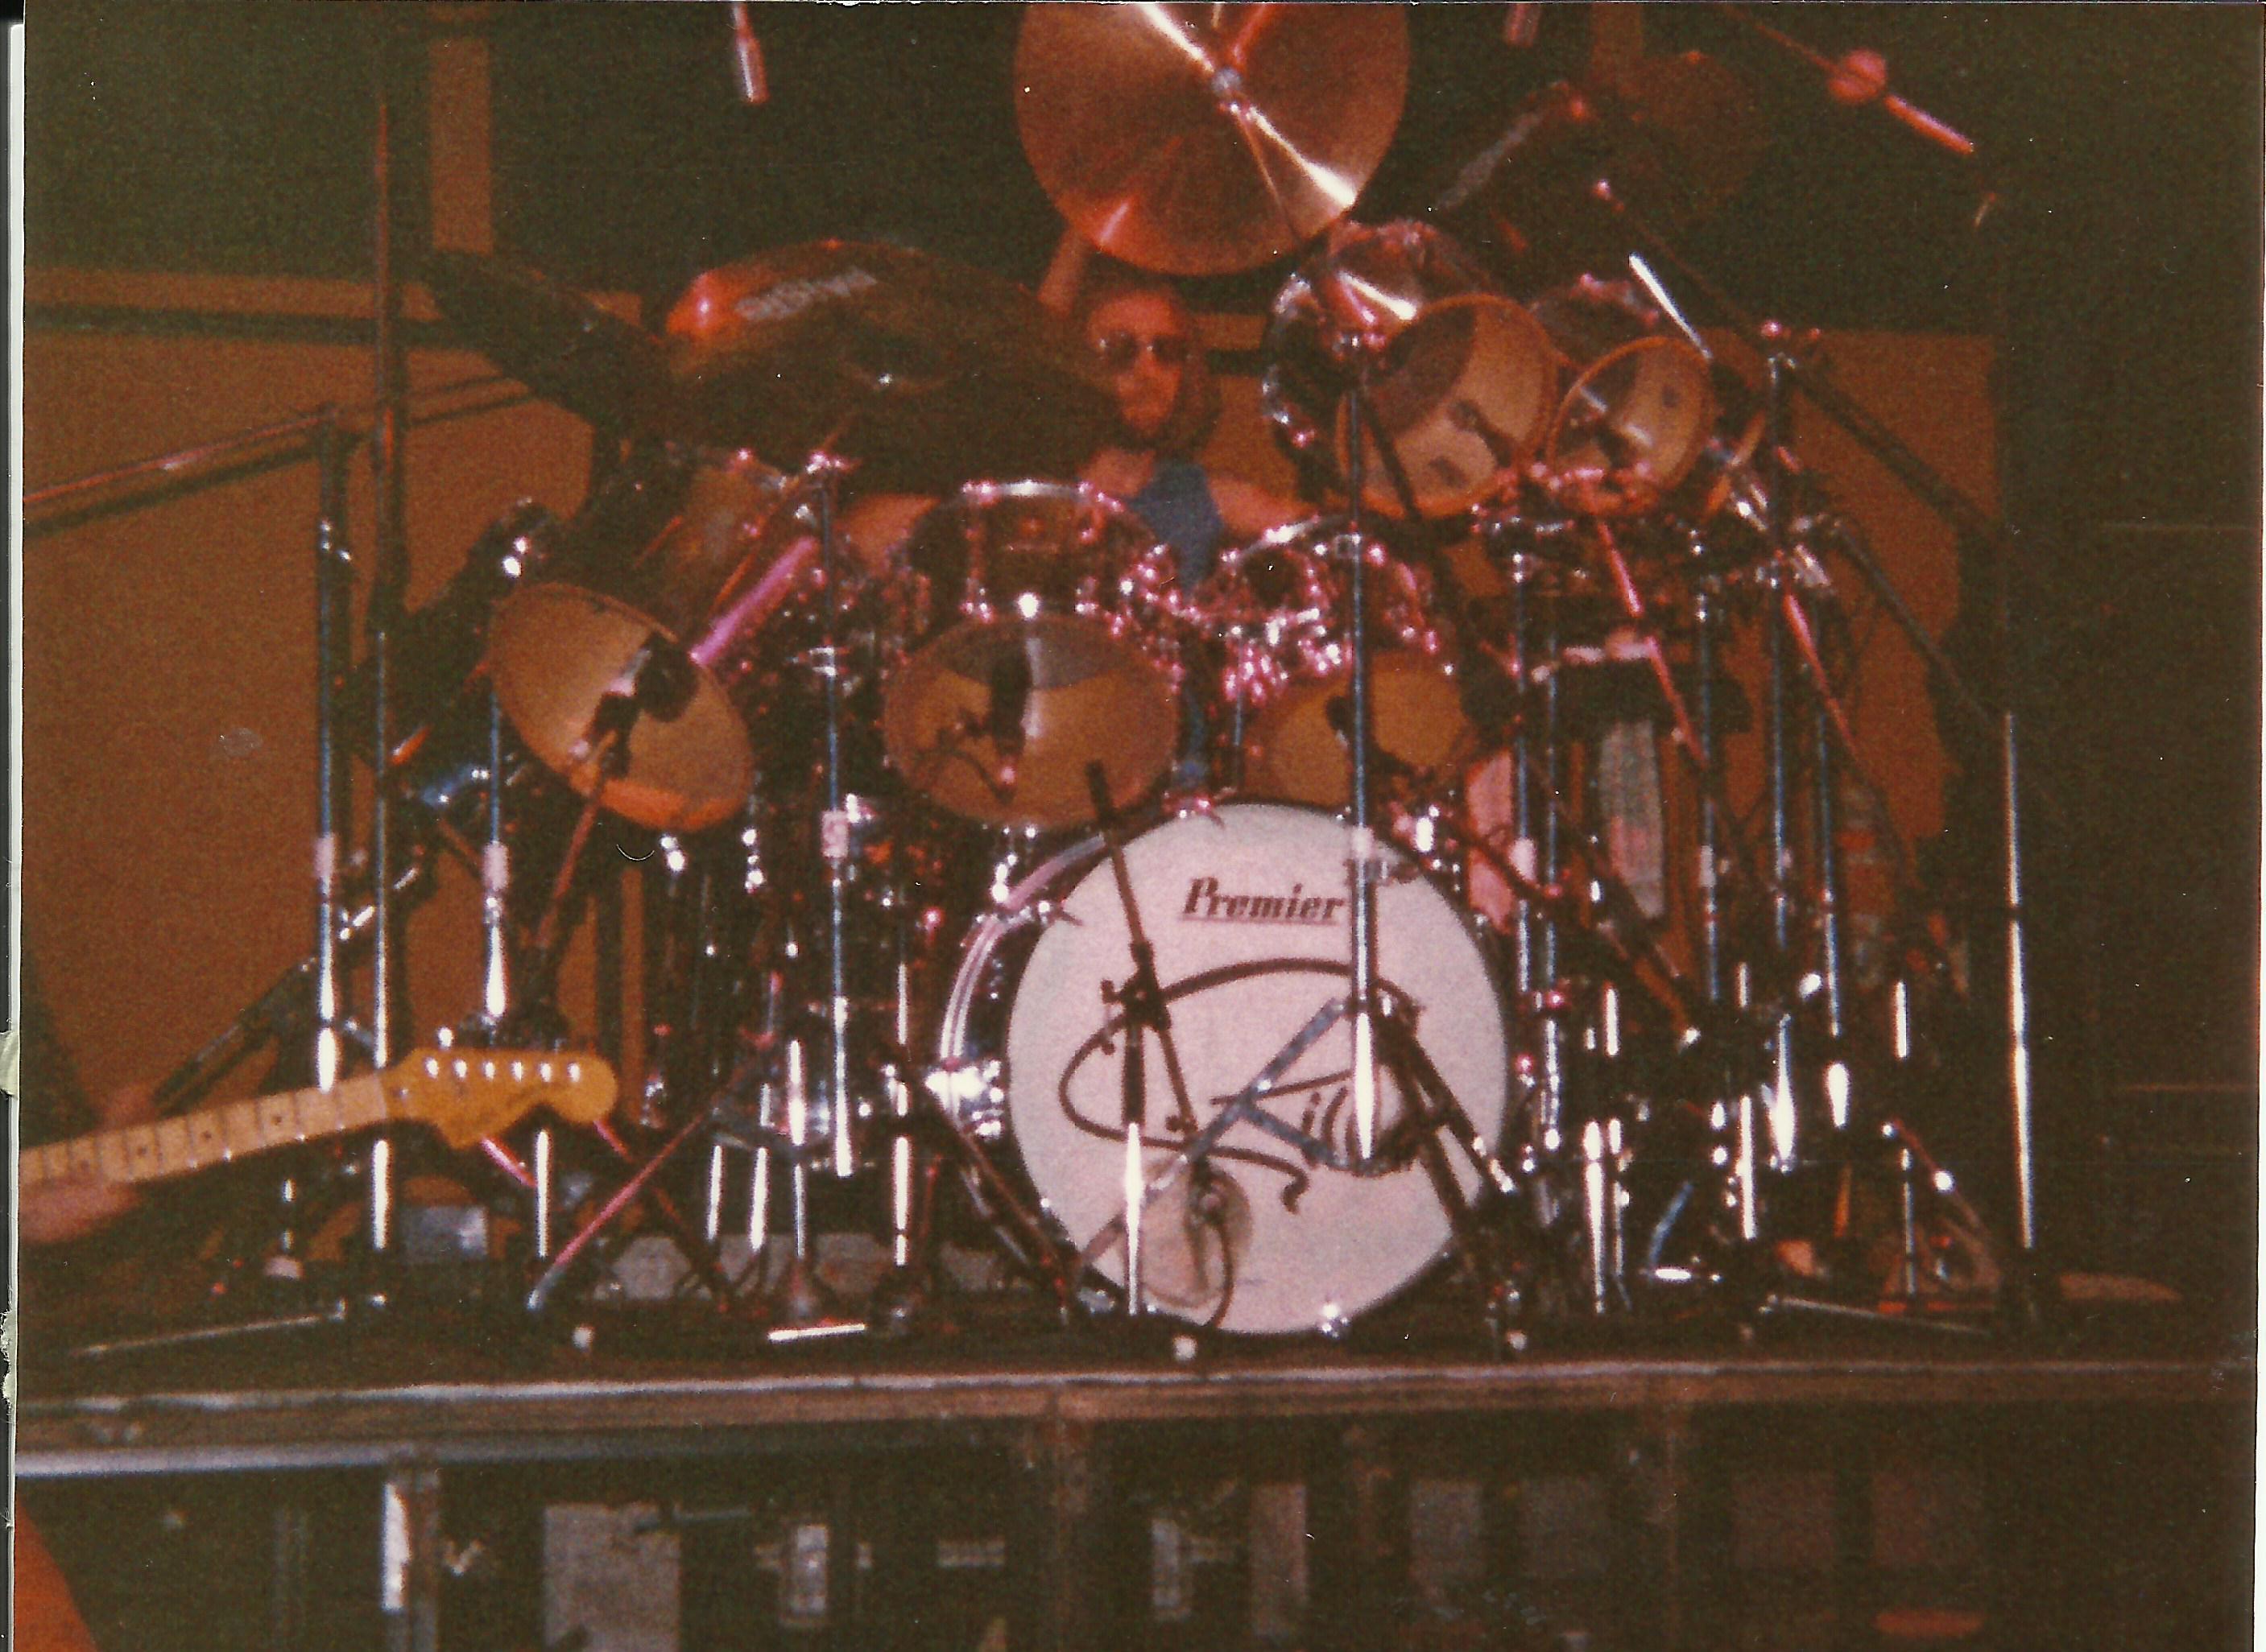 Himangan Urheilutalo 1981 / Mick Underwood, Ian Gillan Band